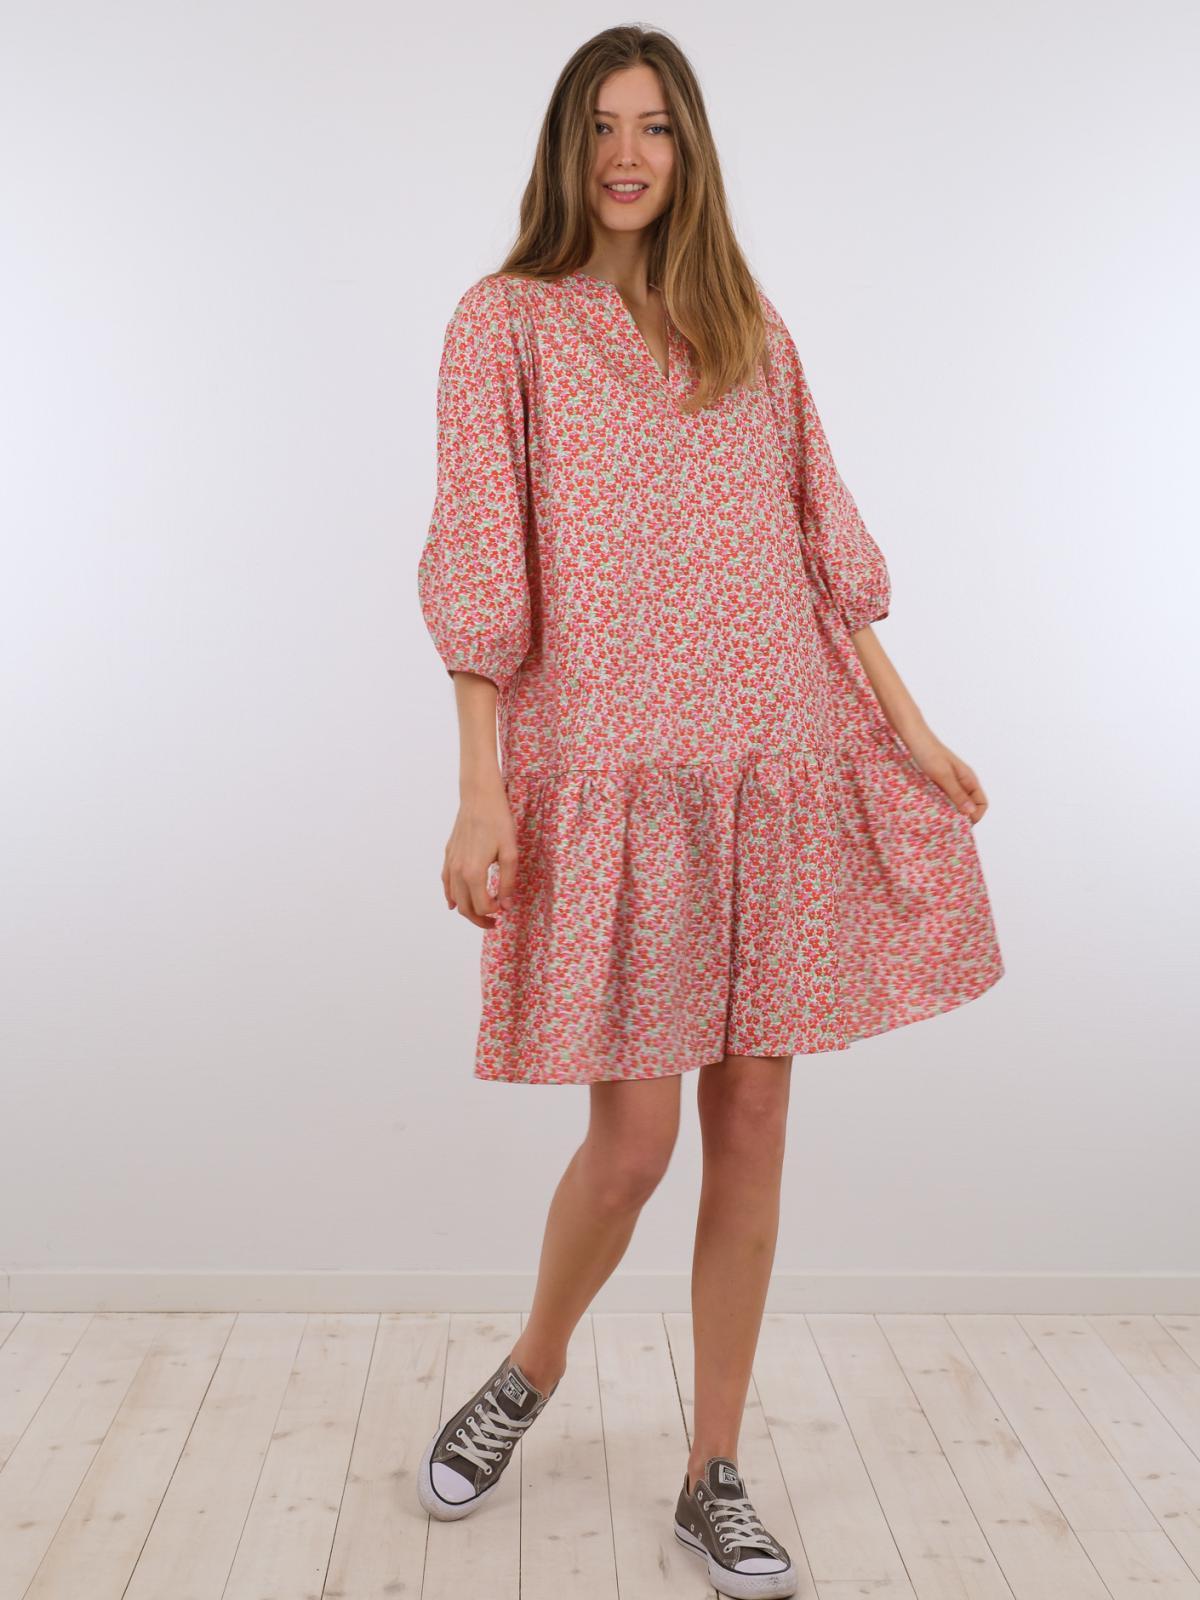 Neo Noir Sammy kjole, coral, 40